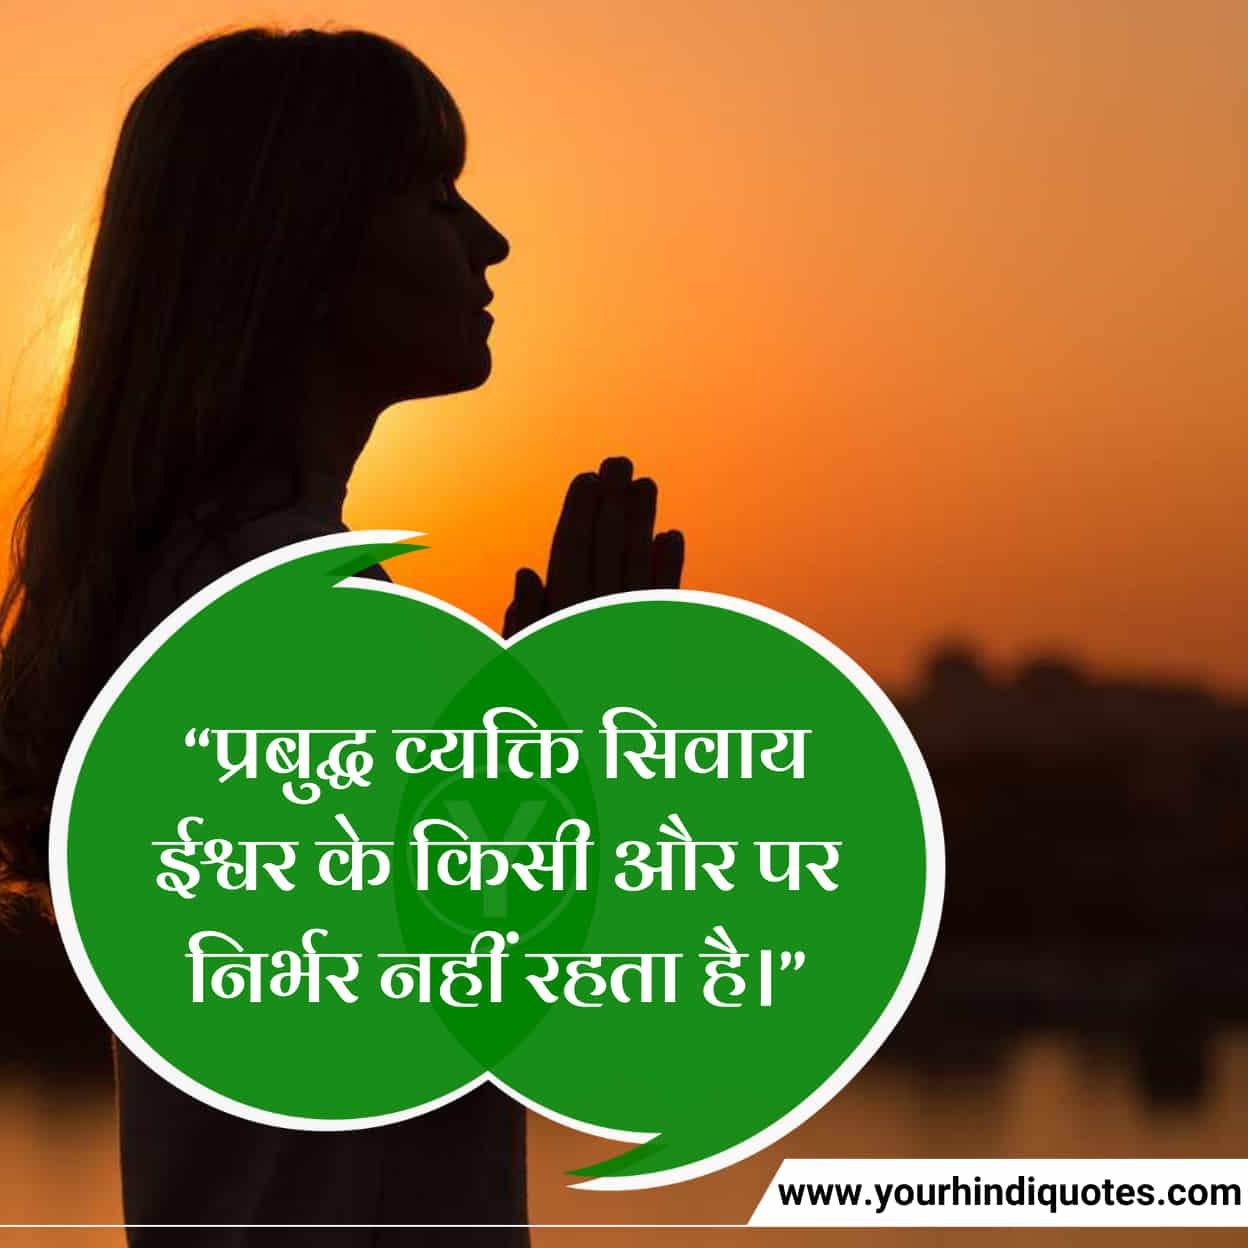 Best Shrimad Bhagwat Gita Quotes in Hindi